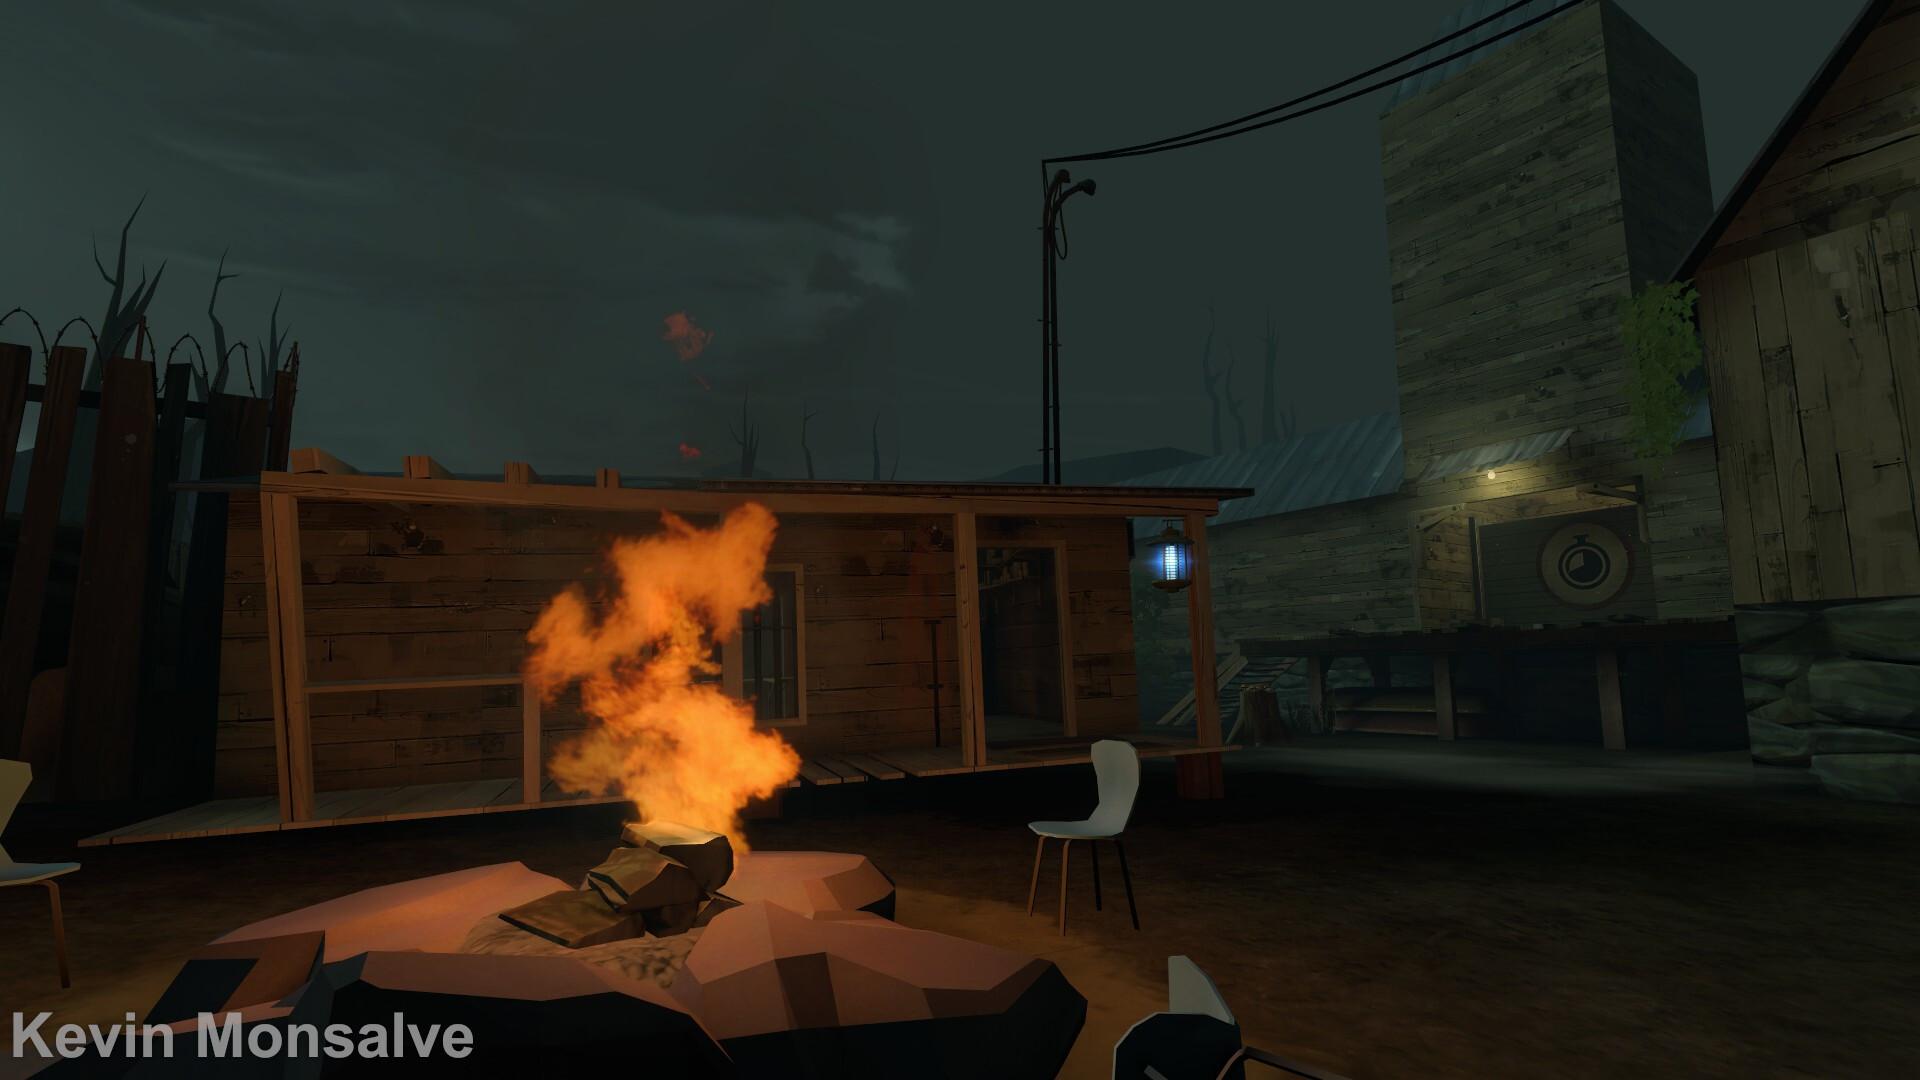 kevin-monsalve-campfire-km.jpg?157227413